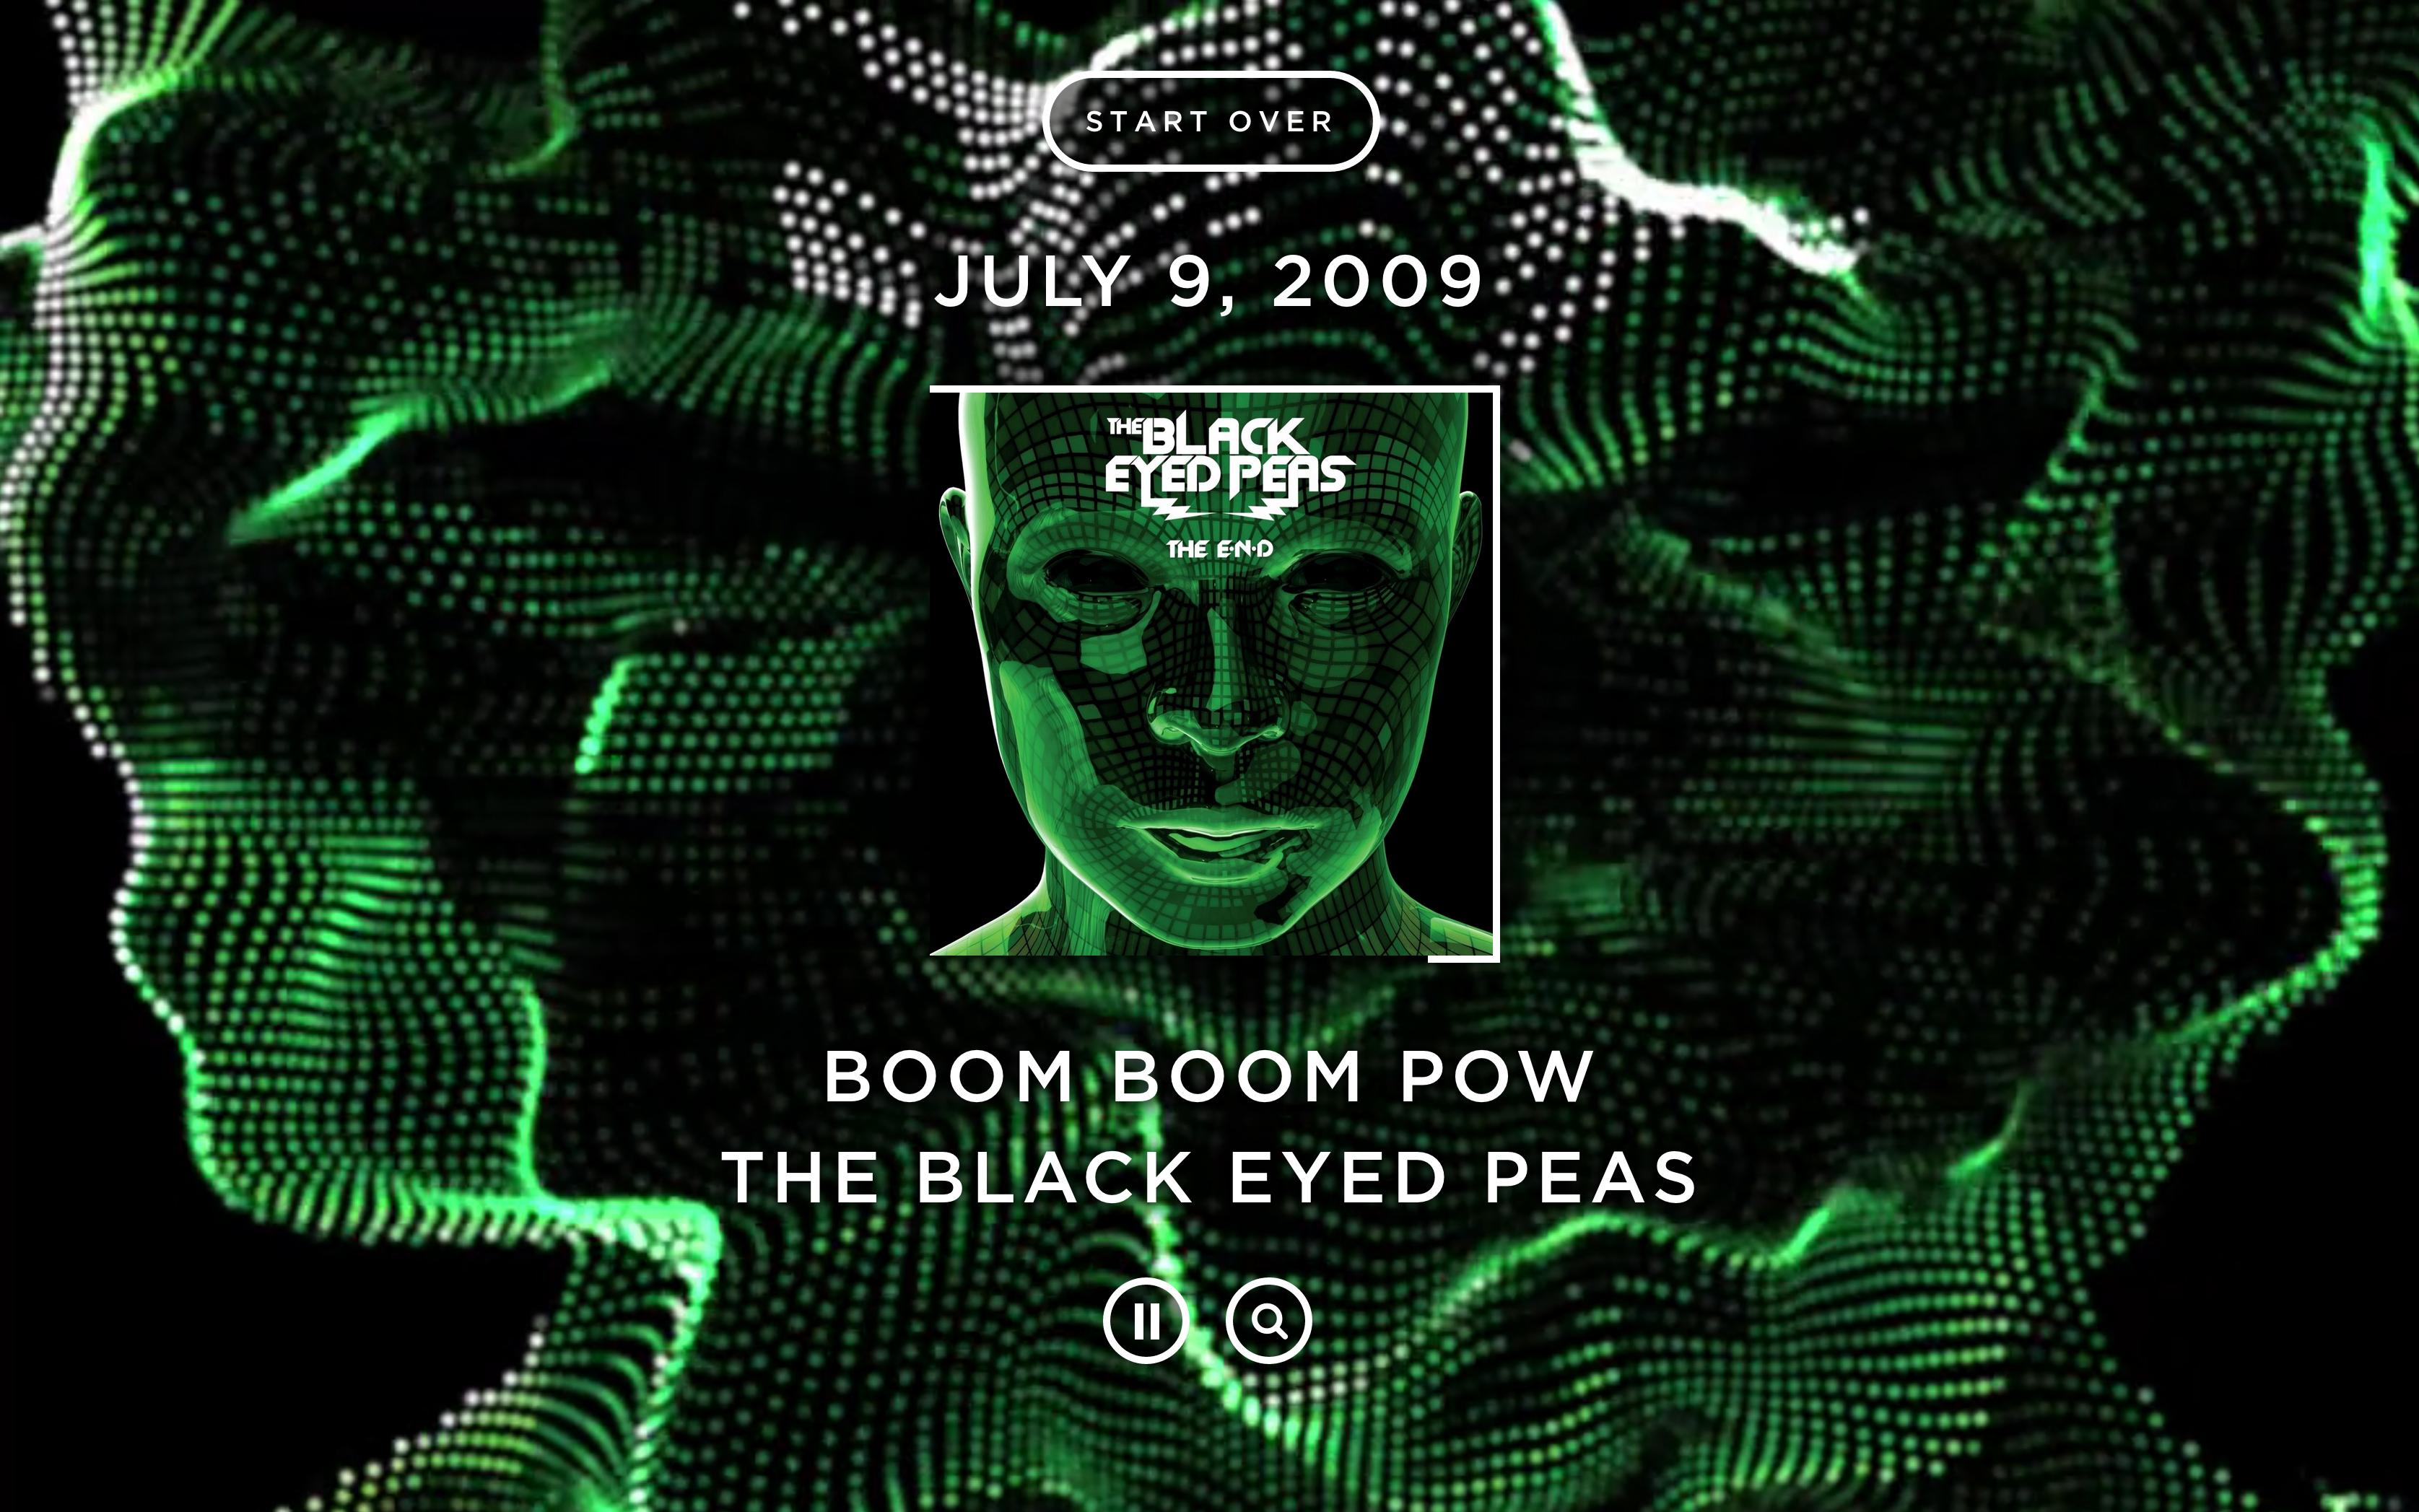 Boomboompow screenshot